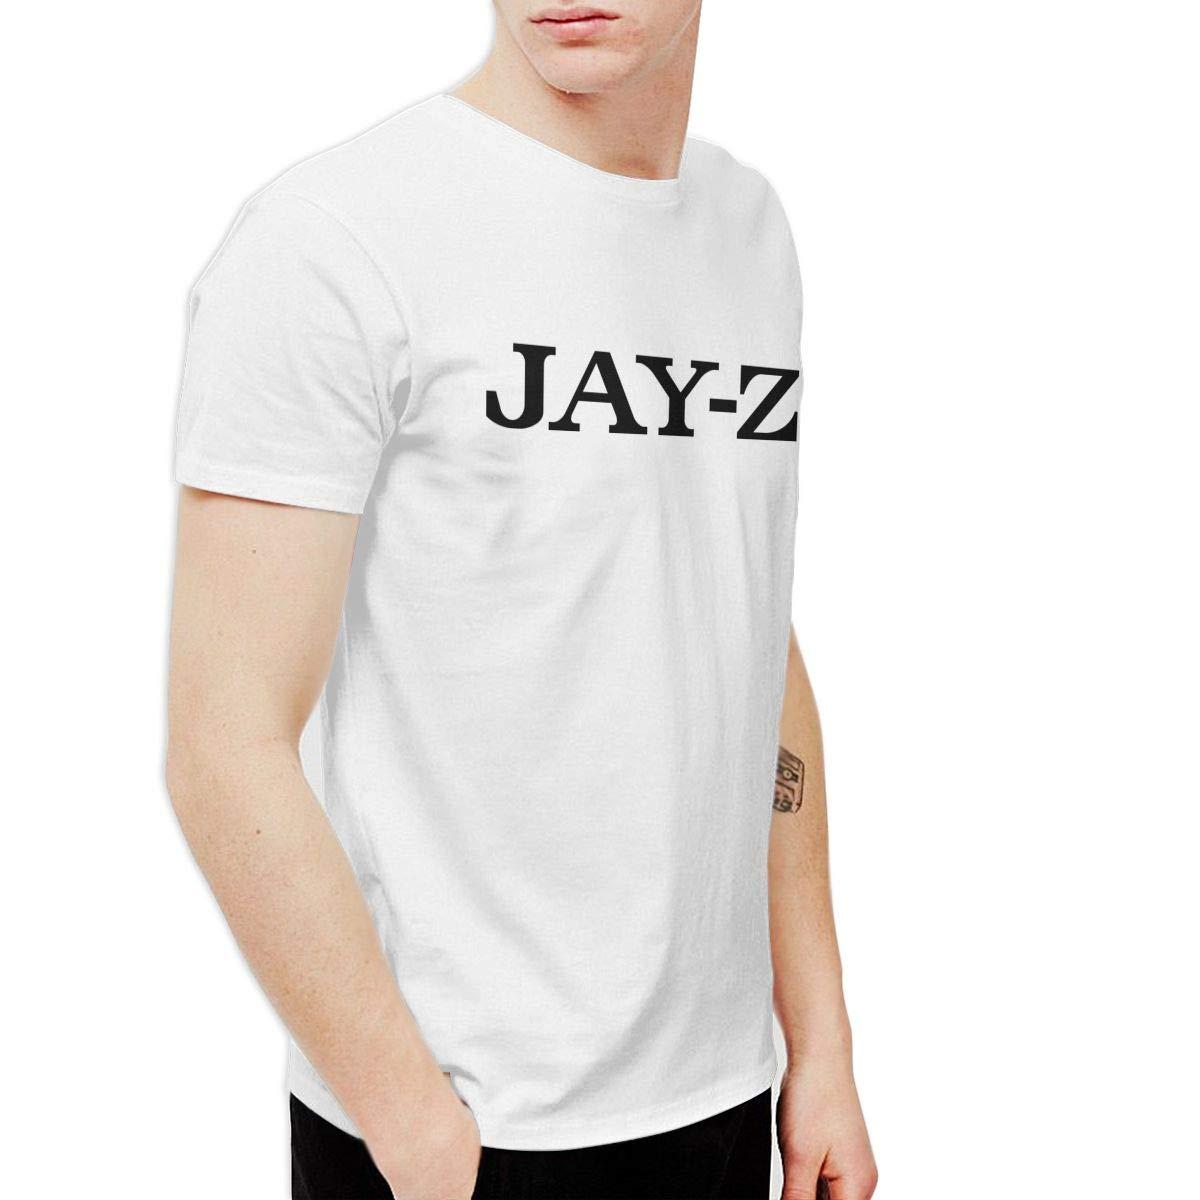 Ofctthlinw S Jay Z Logo Casual Style Jogging Shirt Short Sleeve 7336